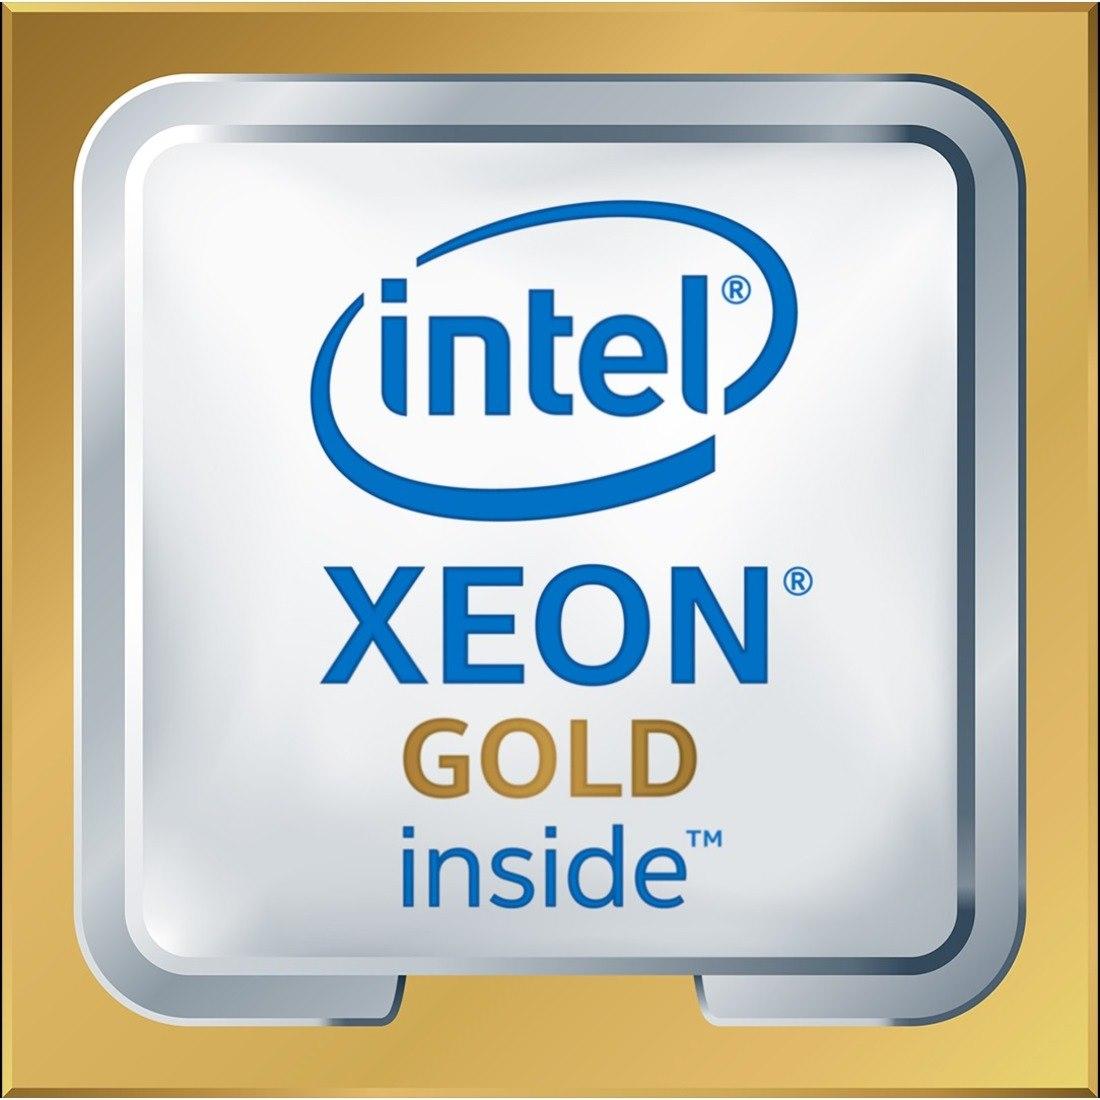 Intel Xeon 5120 Tetradeca-core (14 Core) 2.20 GHz Processor - Retail Pack